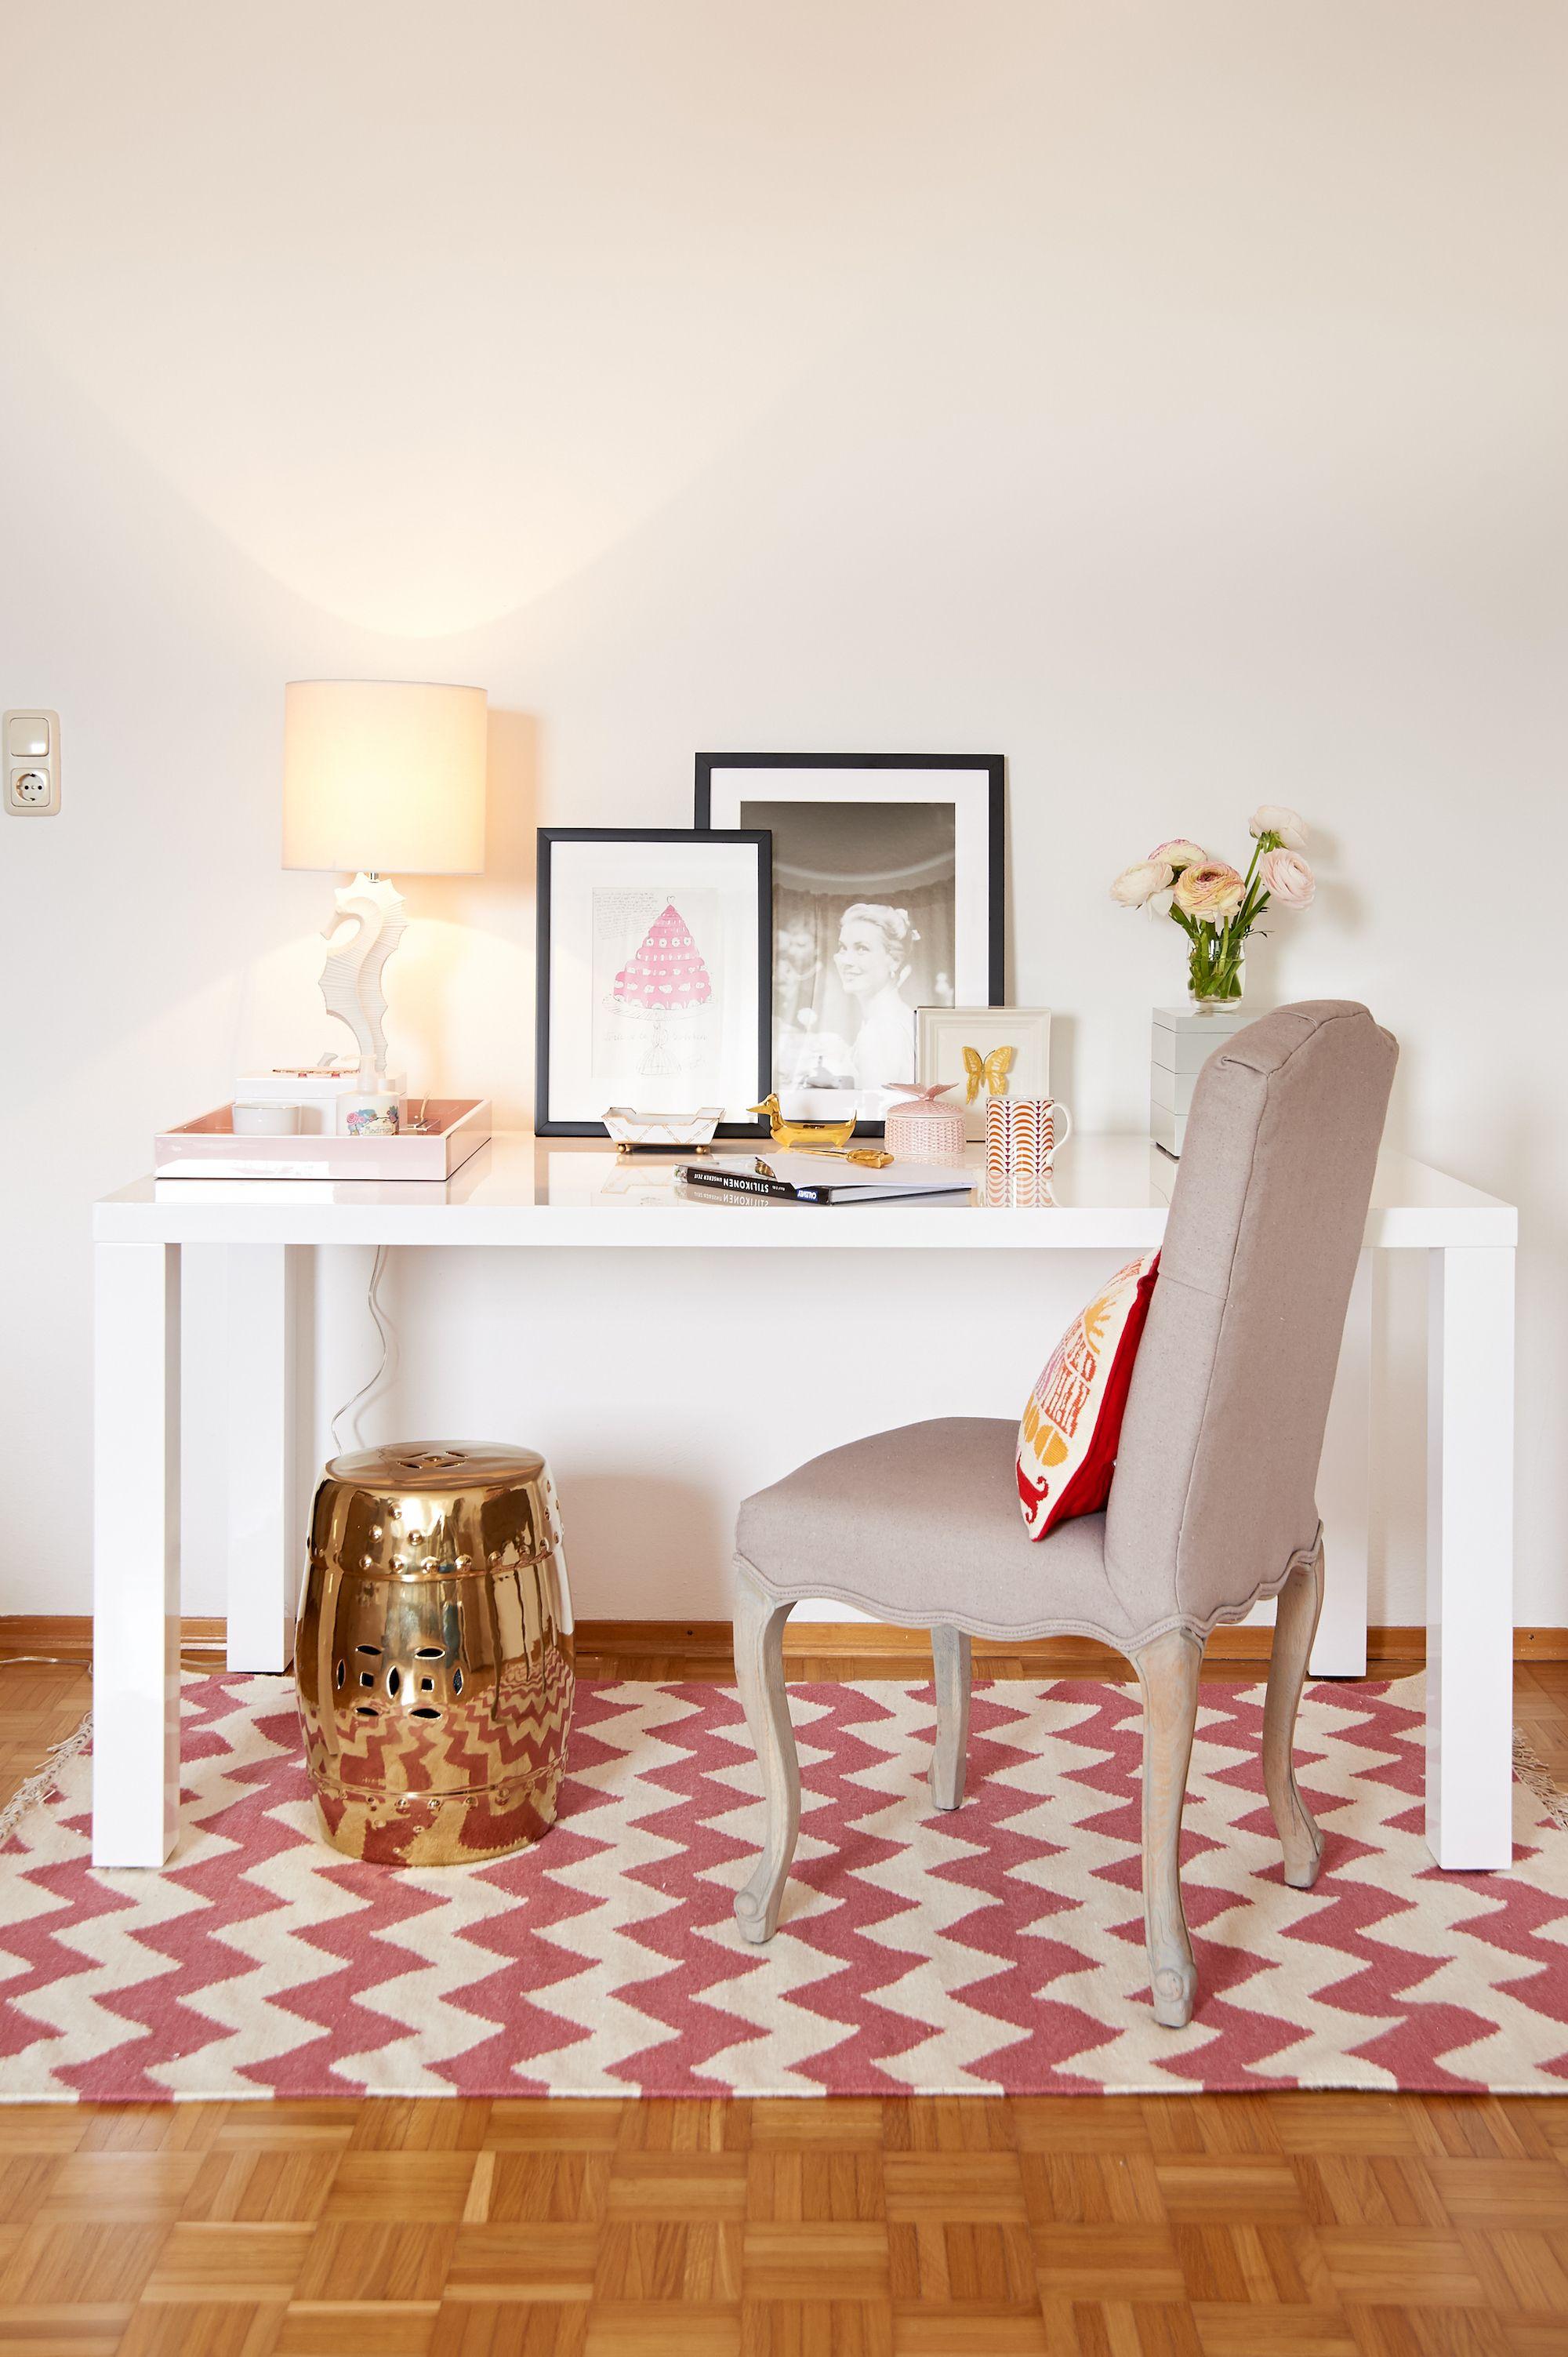 perfektes arbeitszimmer design f r verspielte freigeister kreative rh pinterest at